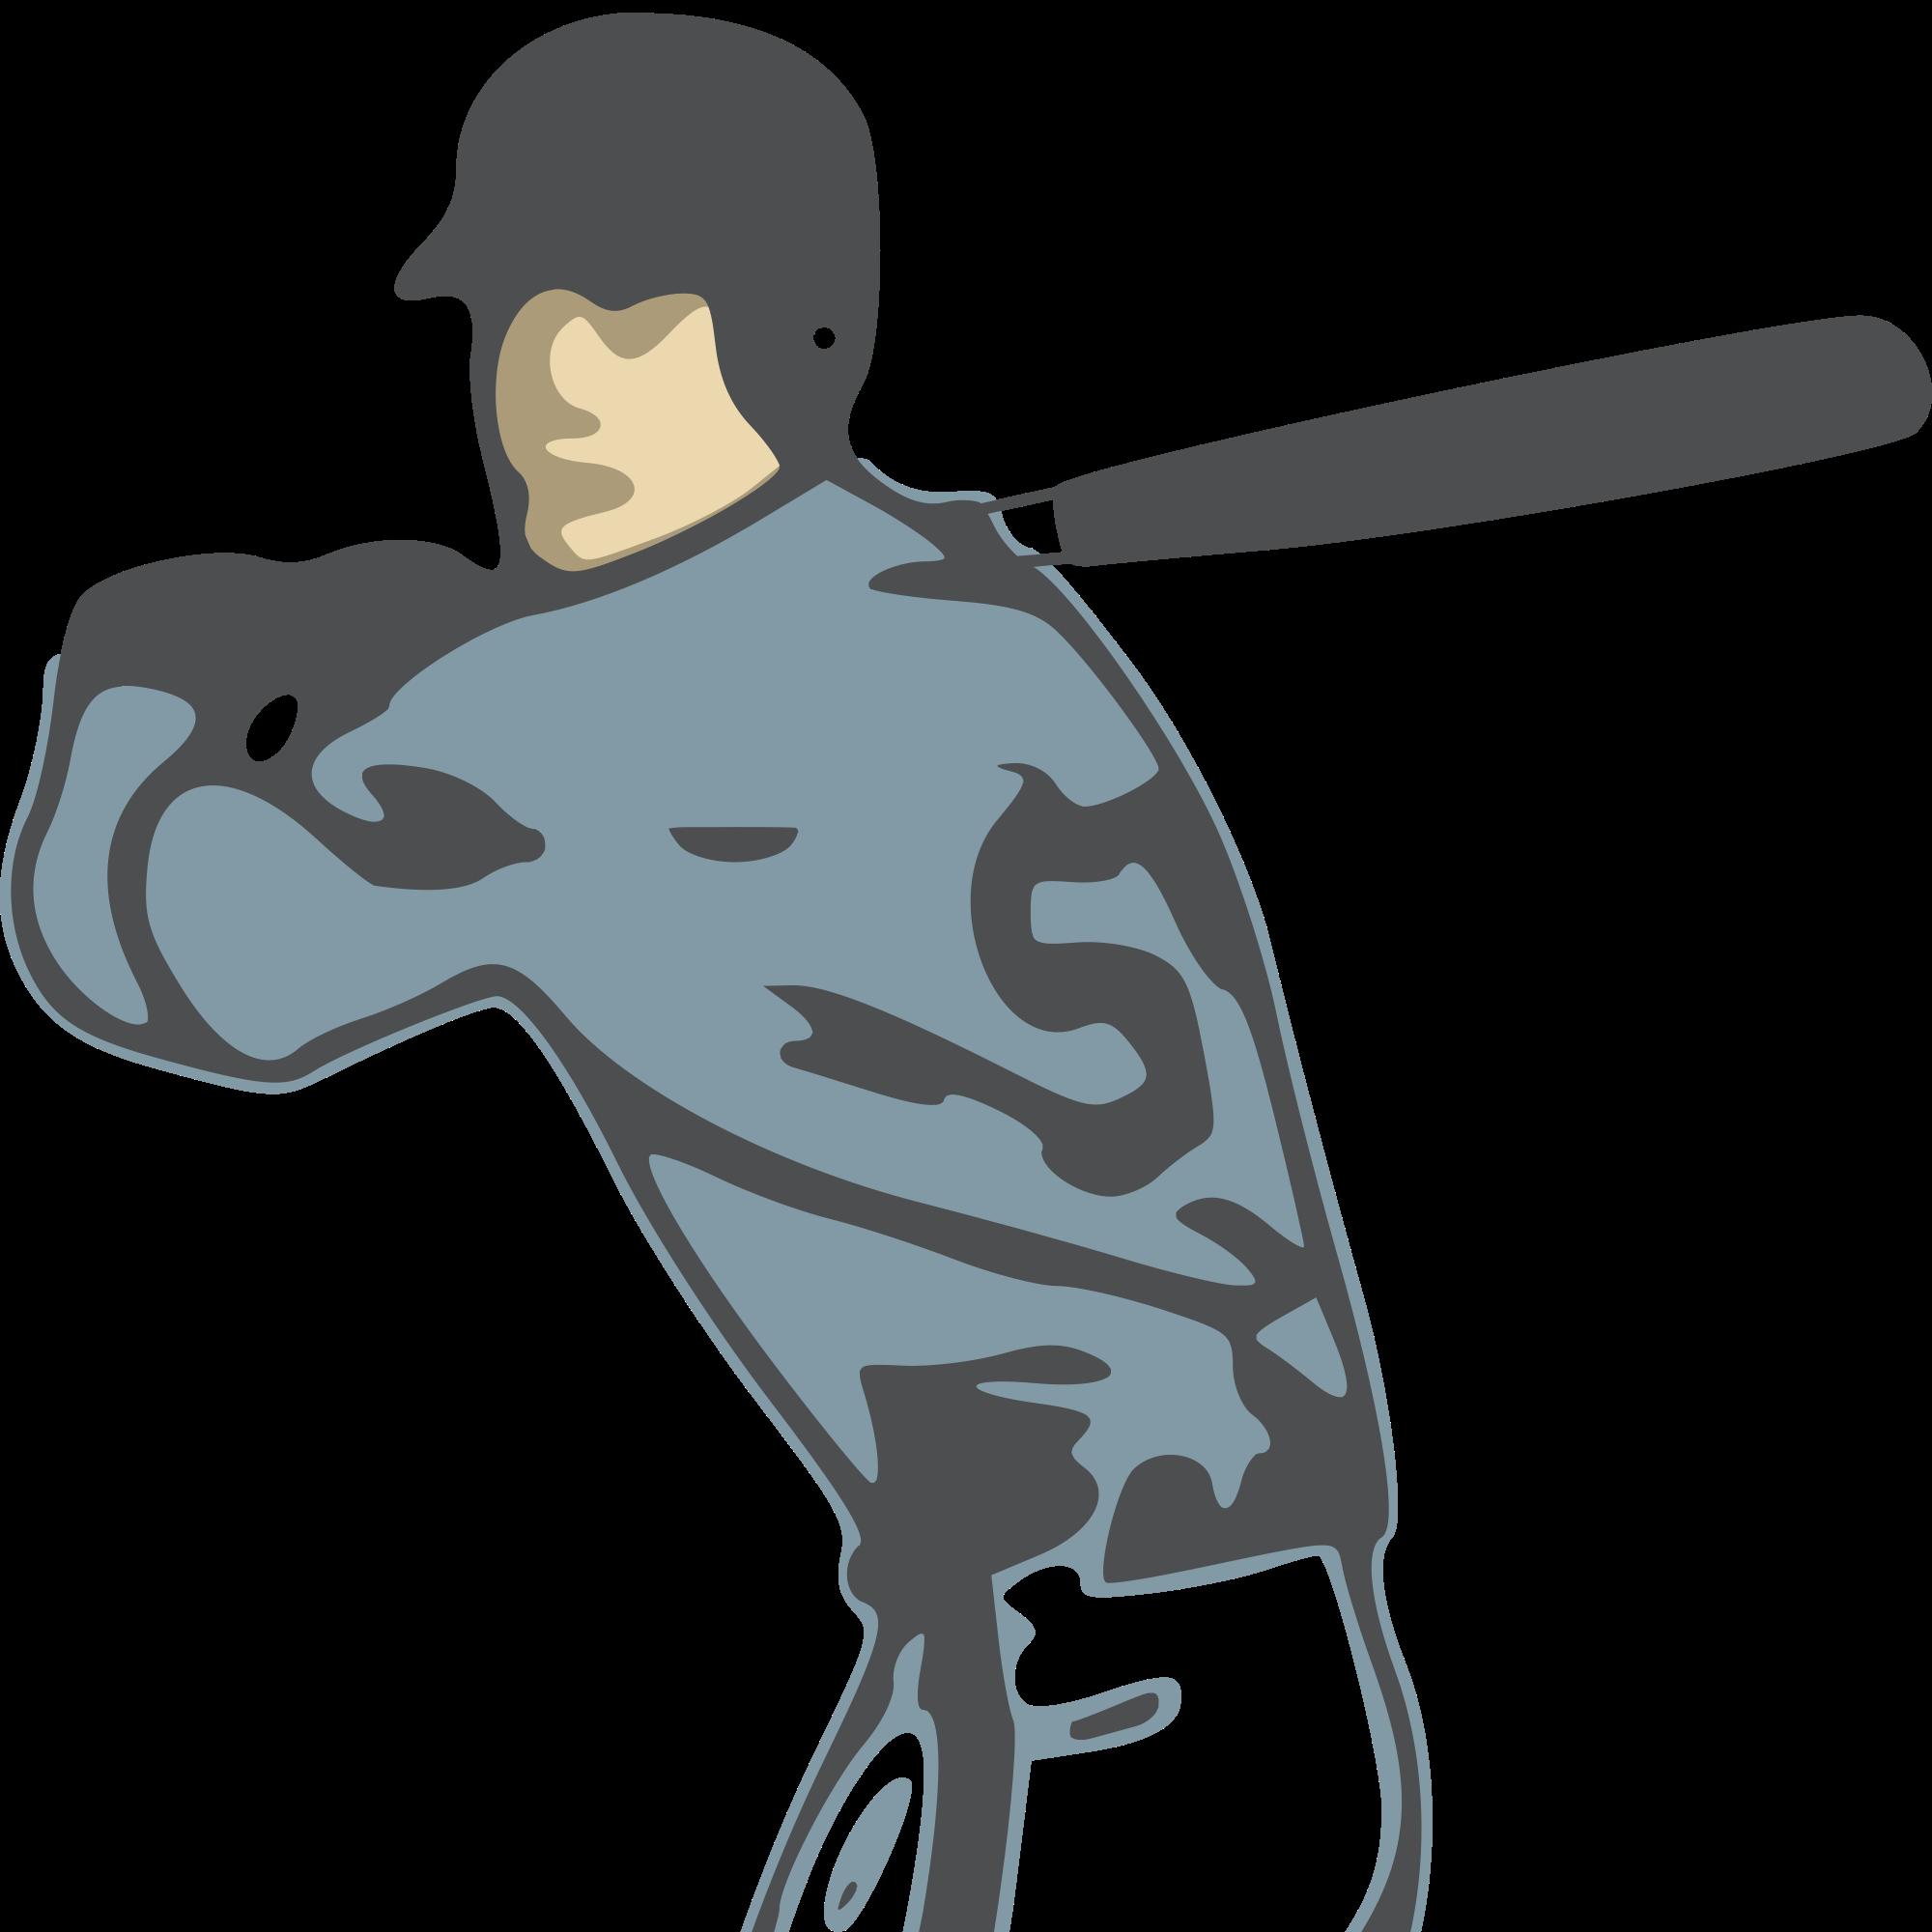 Clipart rocket baseball. Clip art free download